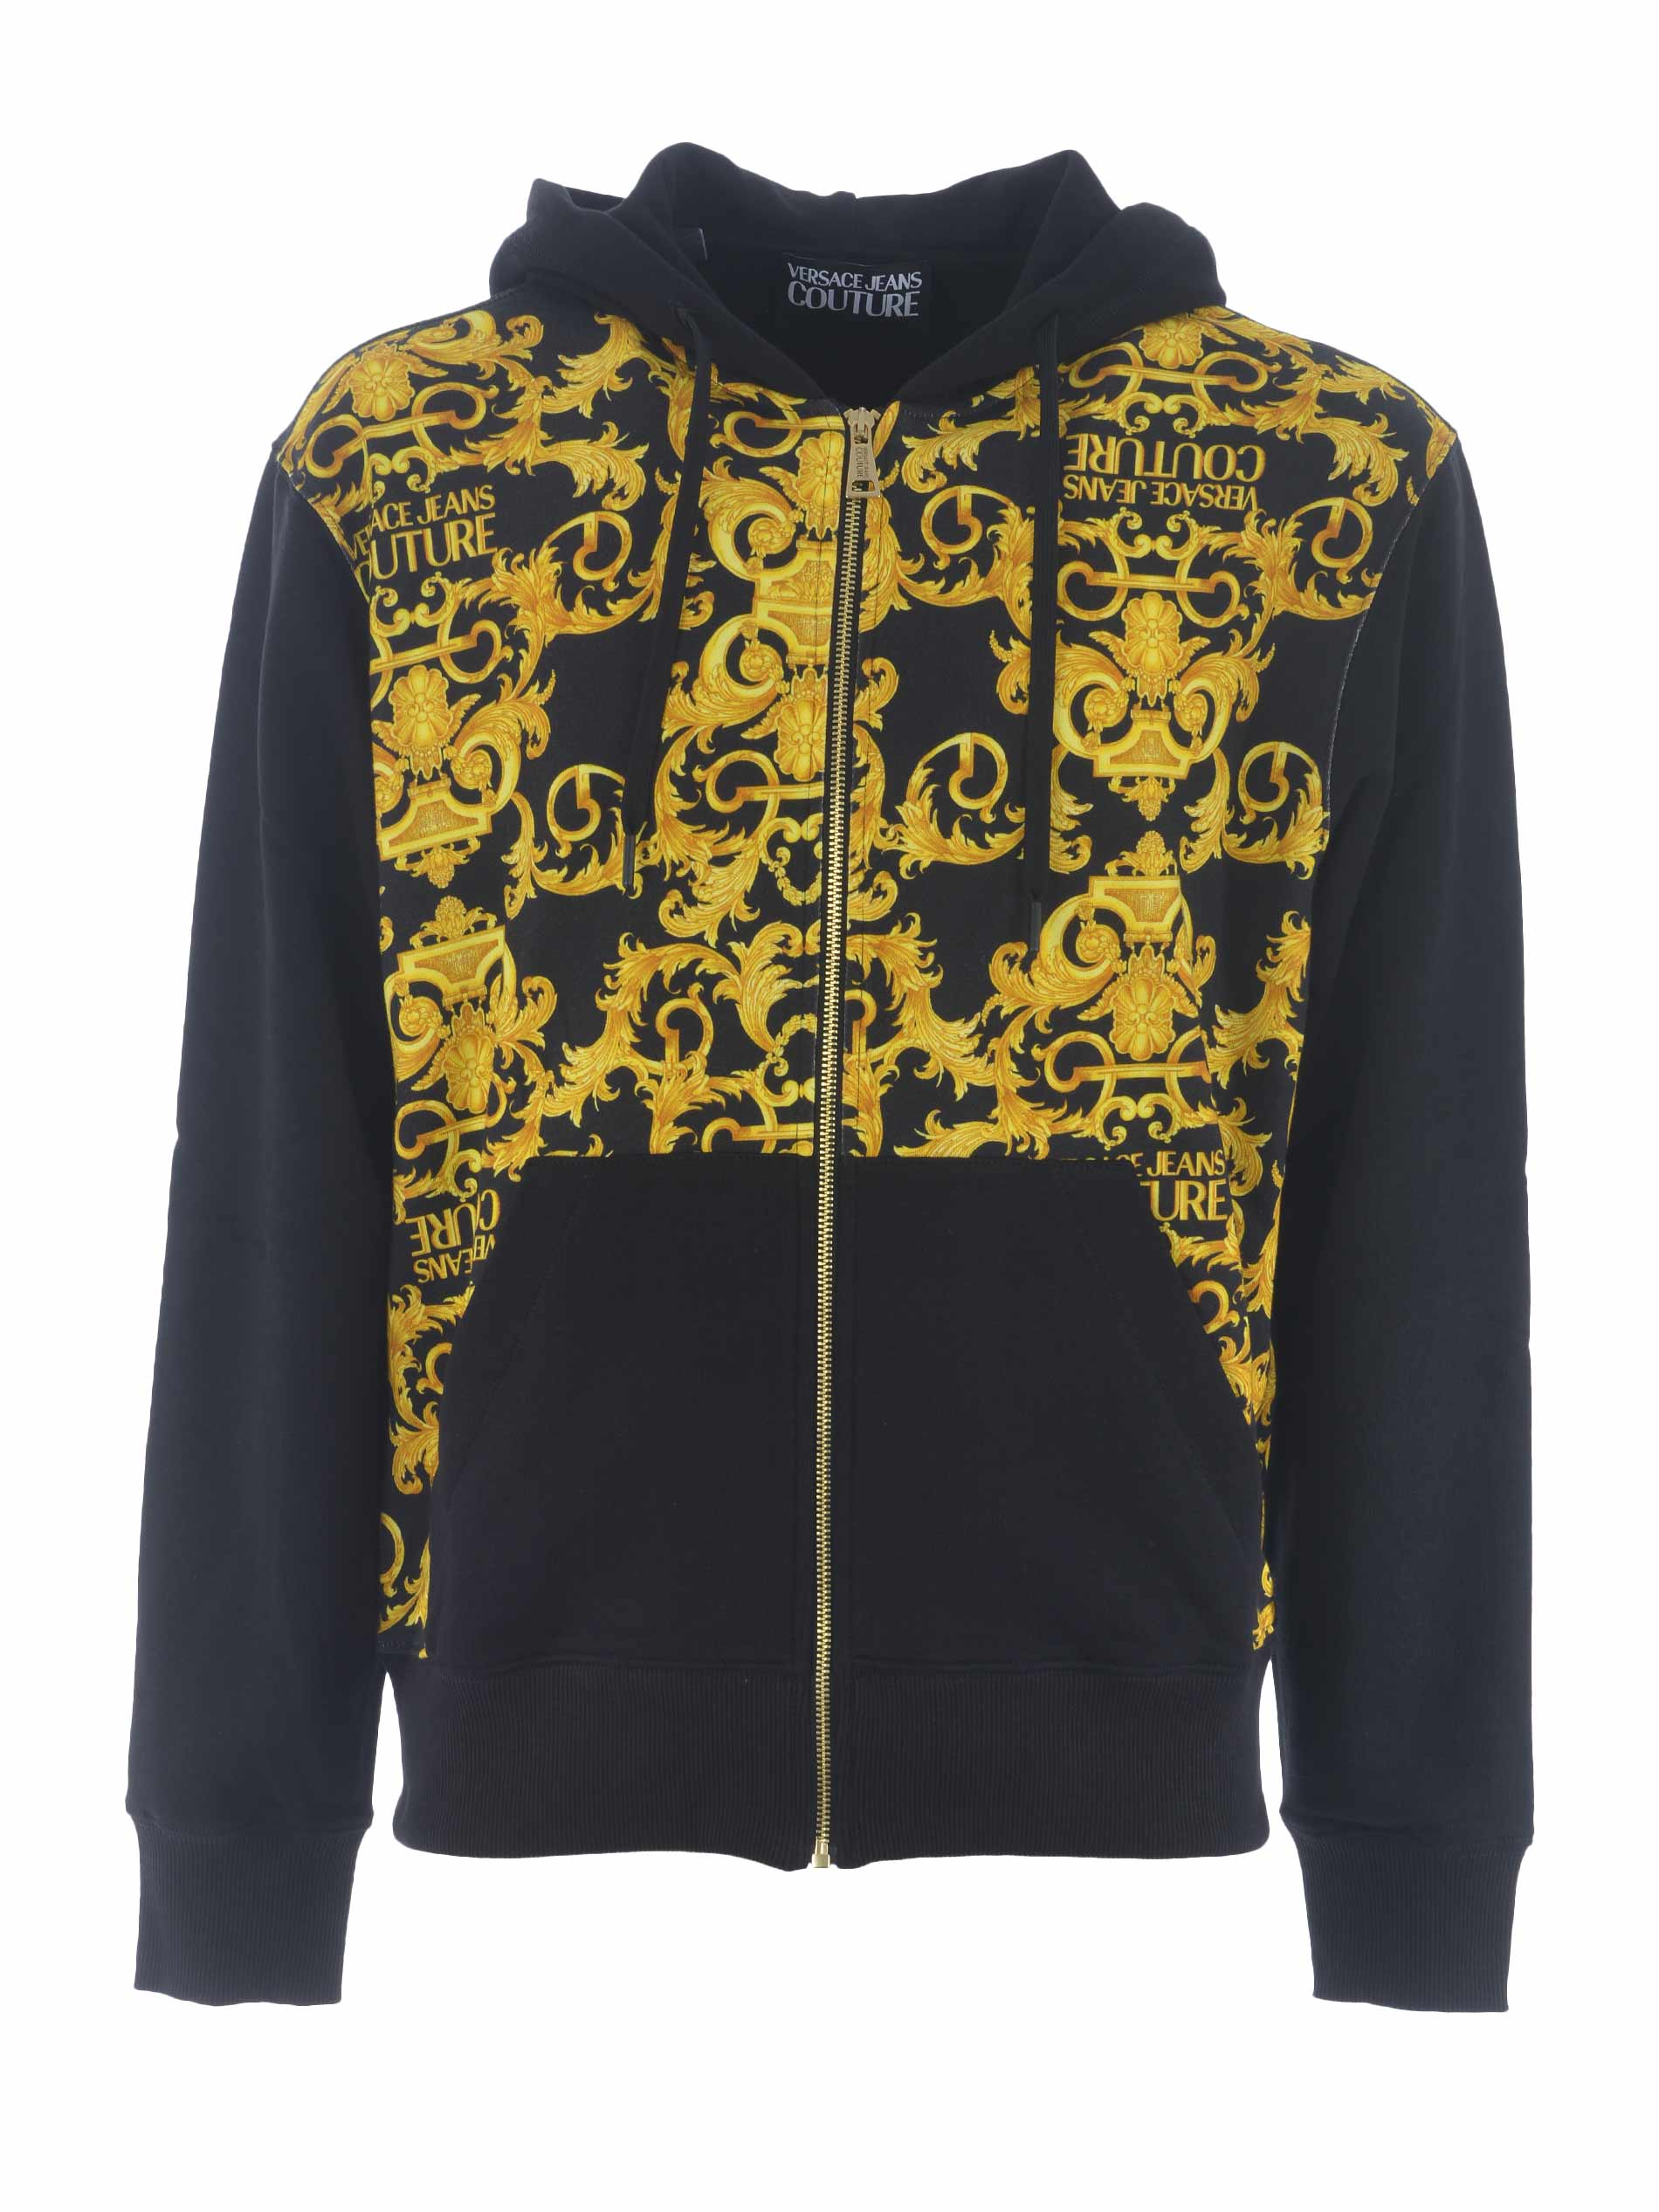 Versace Jeans Couture cotton sweatshirt VERSACE JEANS | 10000005 | B7GWA7F0S0156-899